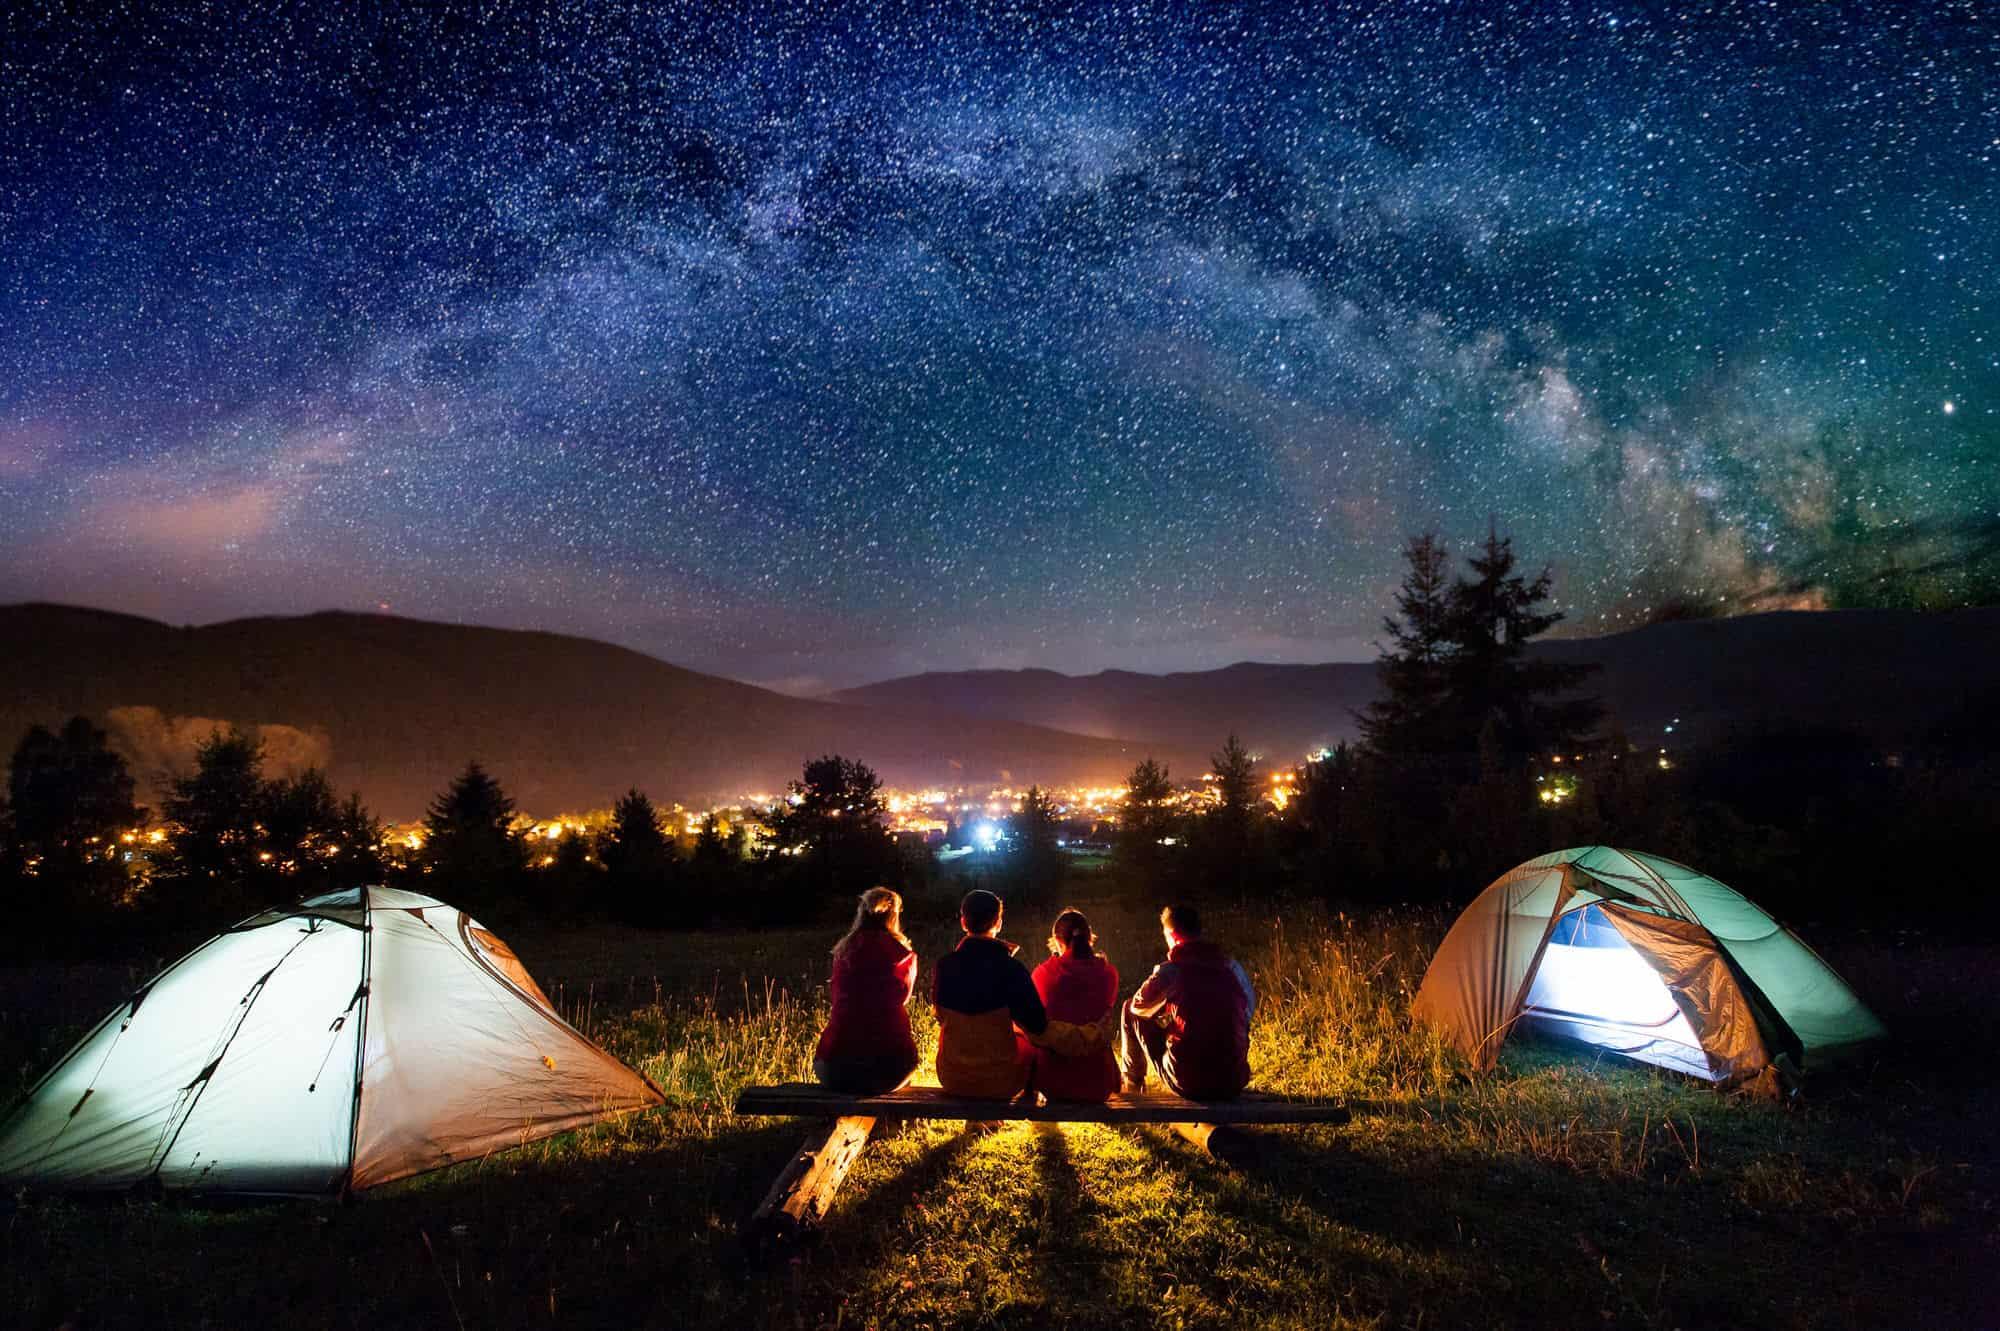 Camping in der Großstadt